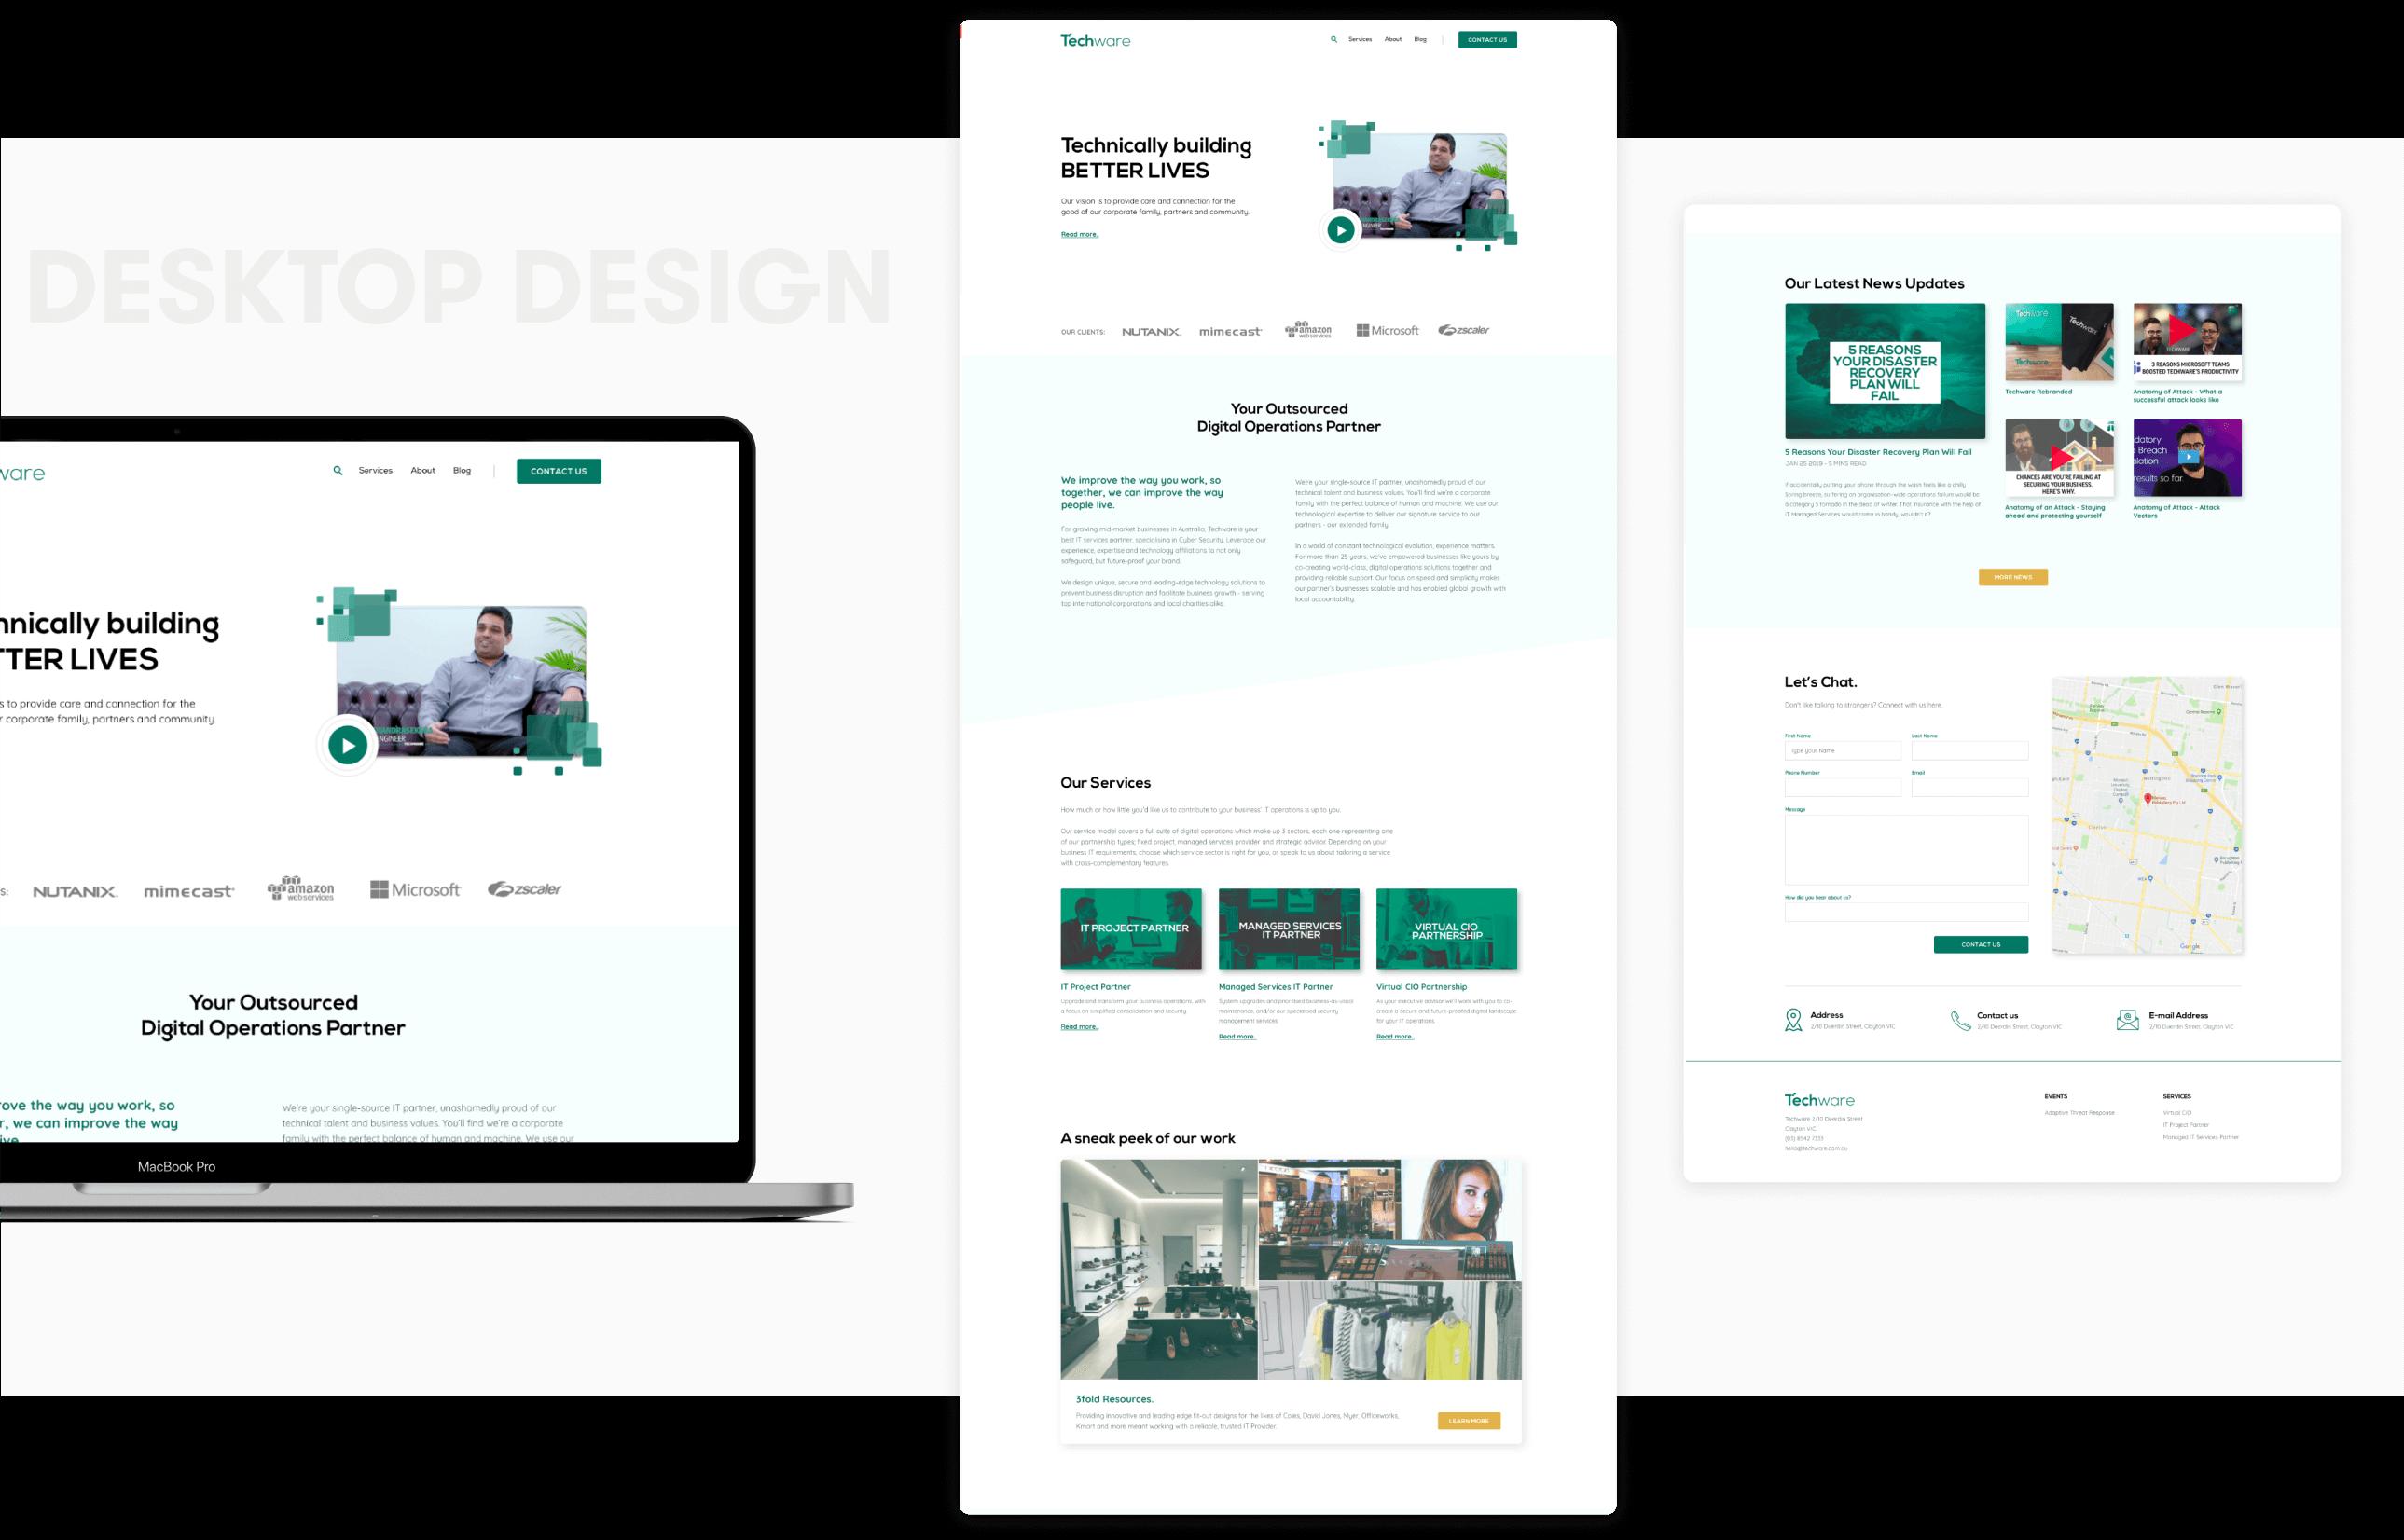 Techware Desktop | Design and development by wowdesign